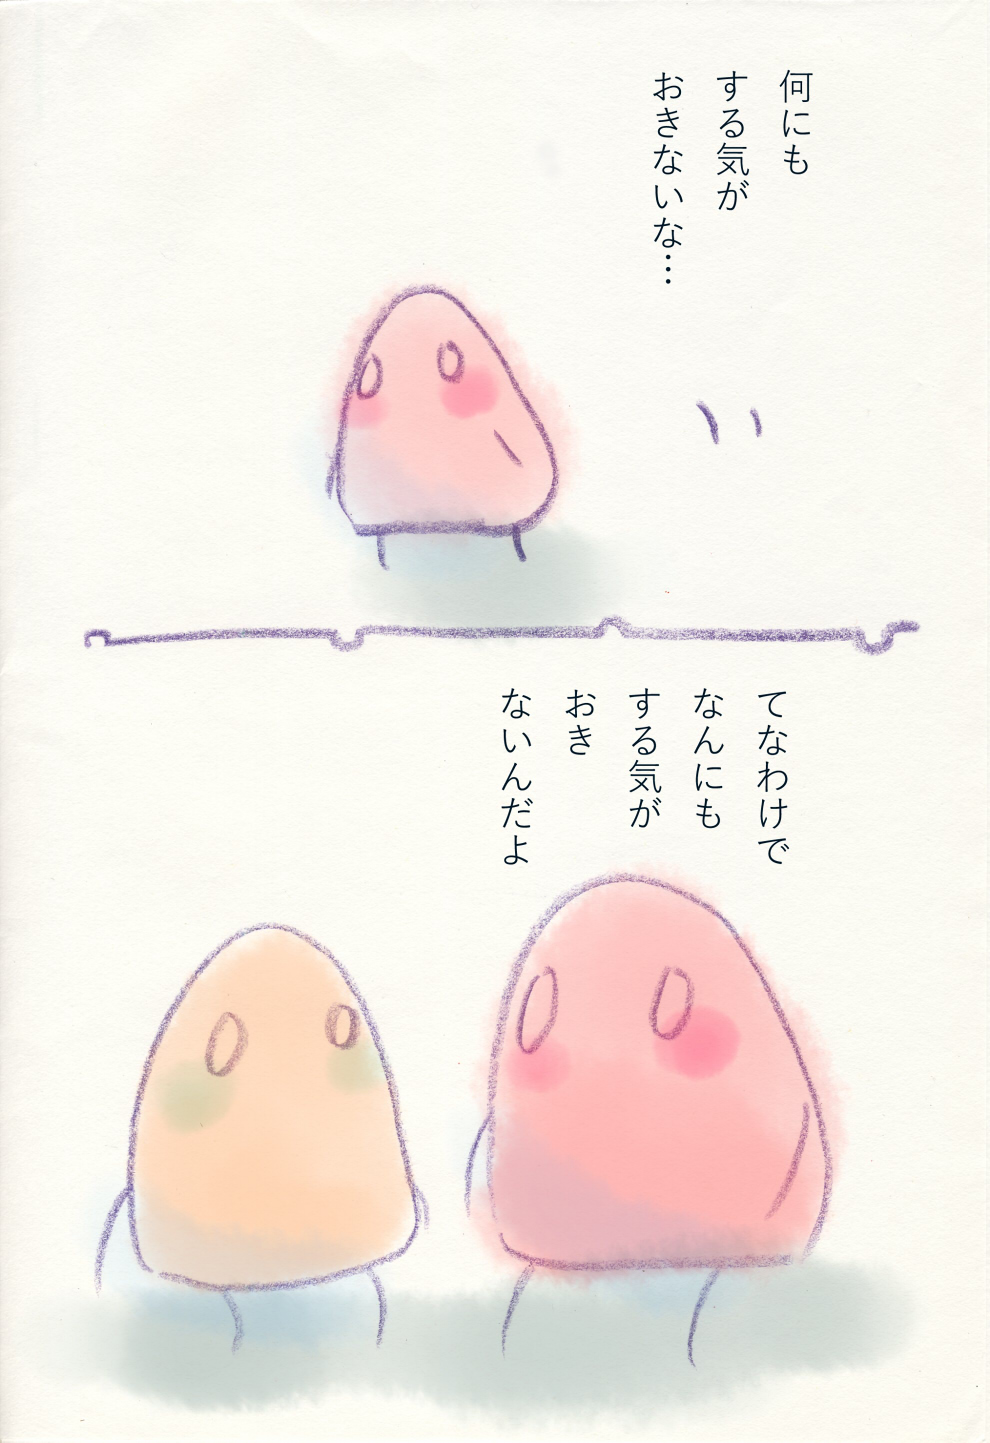 http://ahito.com/comic/short/nega/img//20170808_2/01.jpg